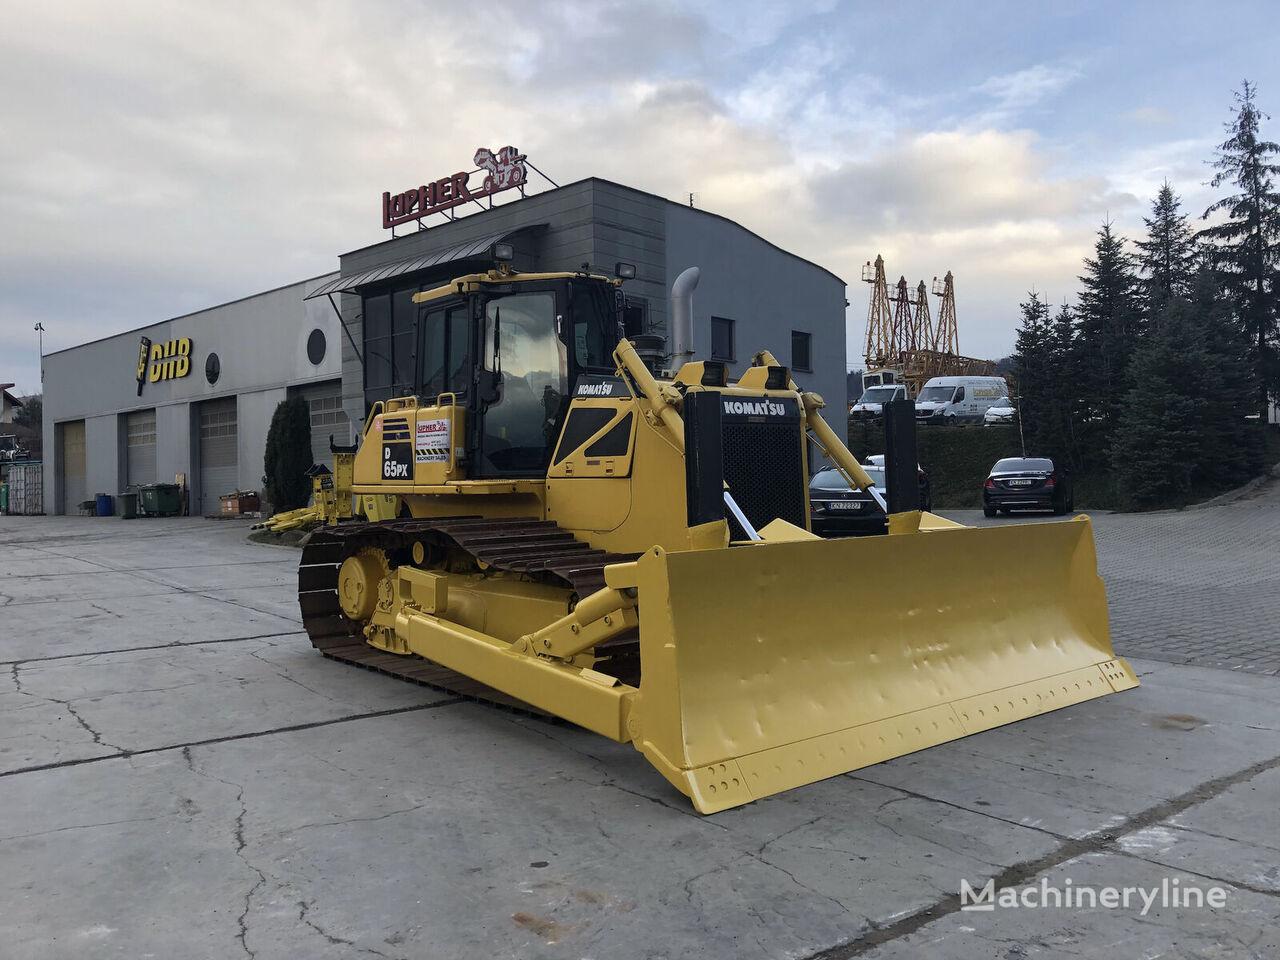 KOMATSU D65PX-16 bulldozer